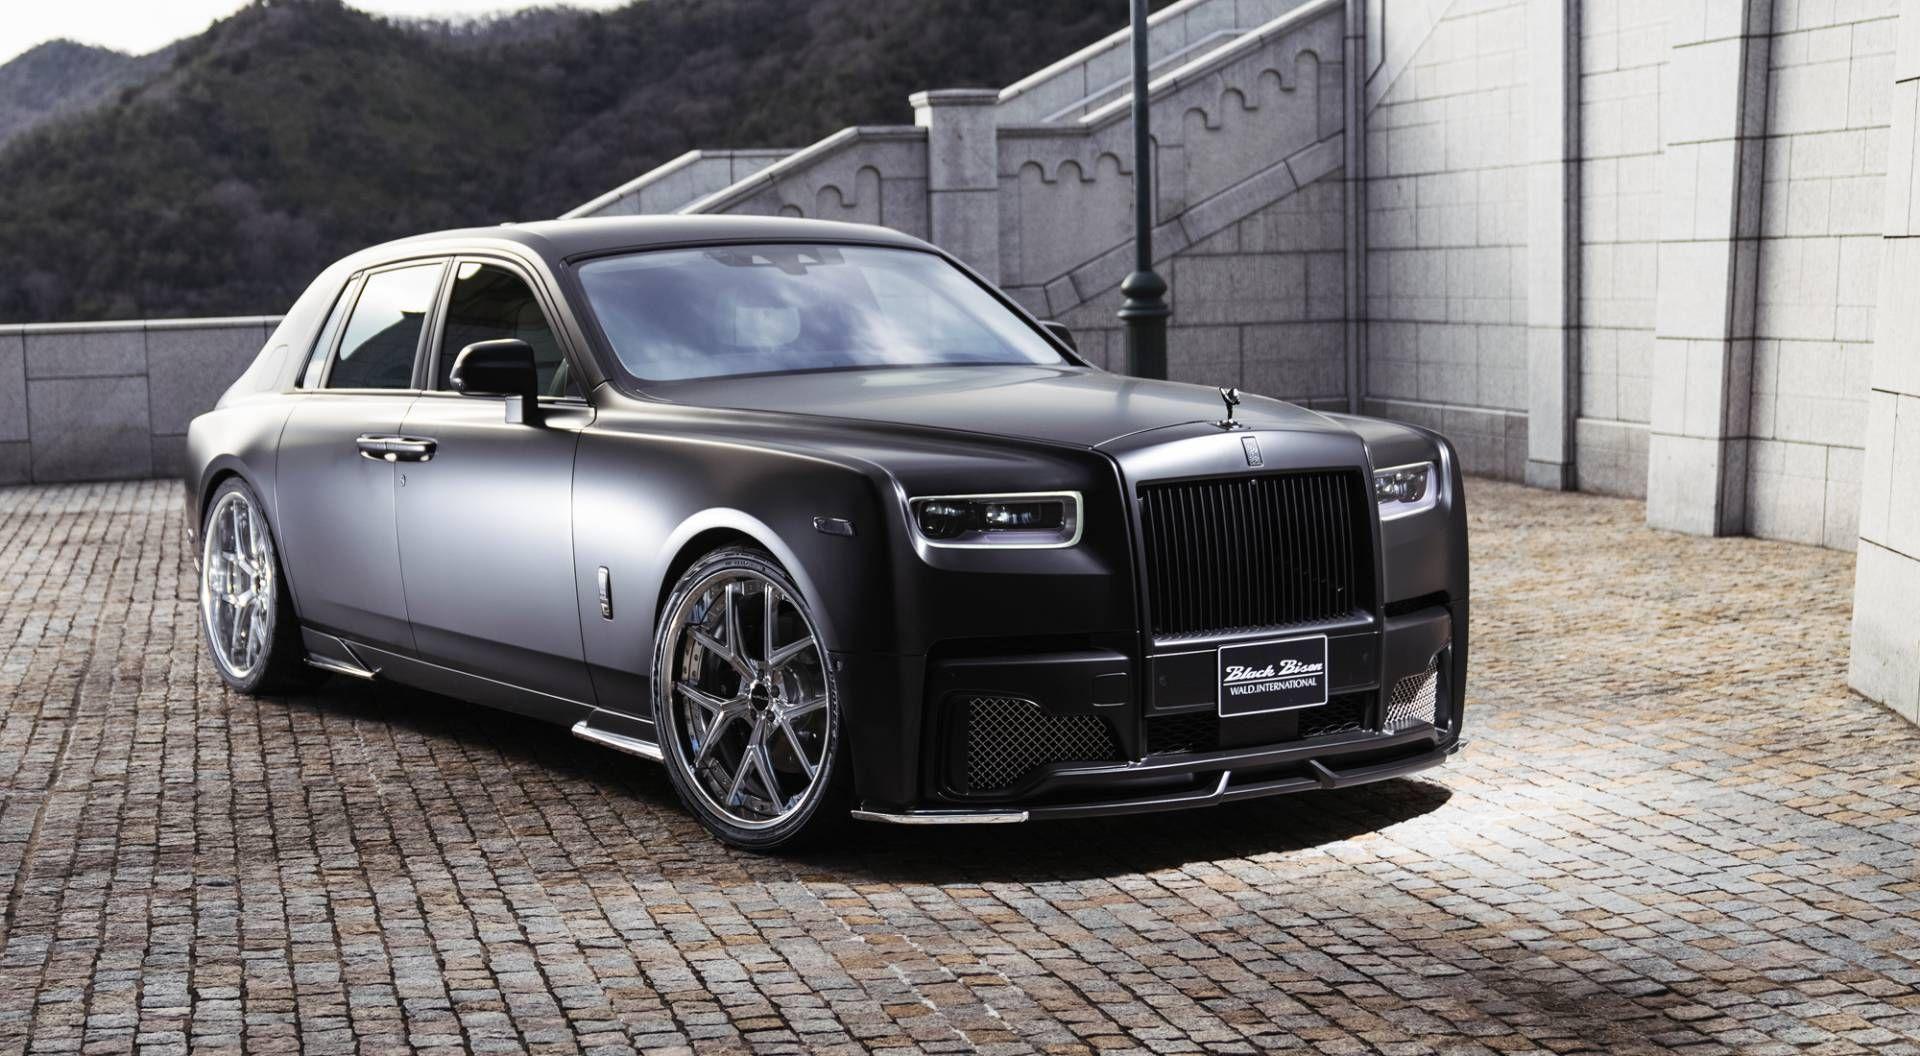 Rolls Royce Phantom Takes A Ride To The Dark Wald Side Carscoops Rolls Royce Phantom Rolls Royce Royce